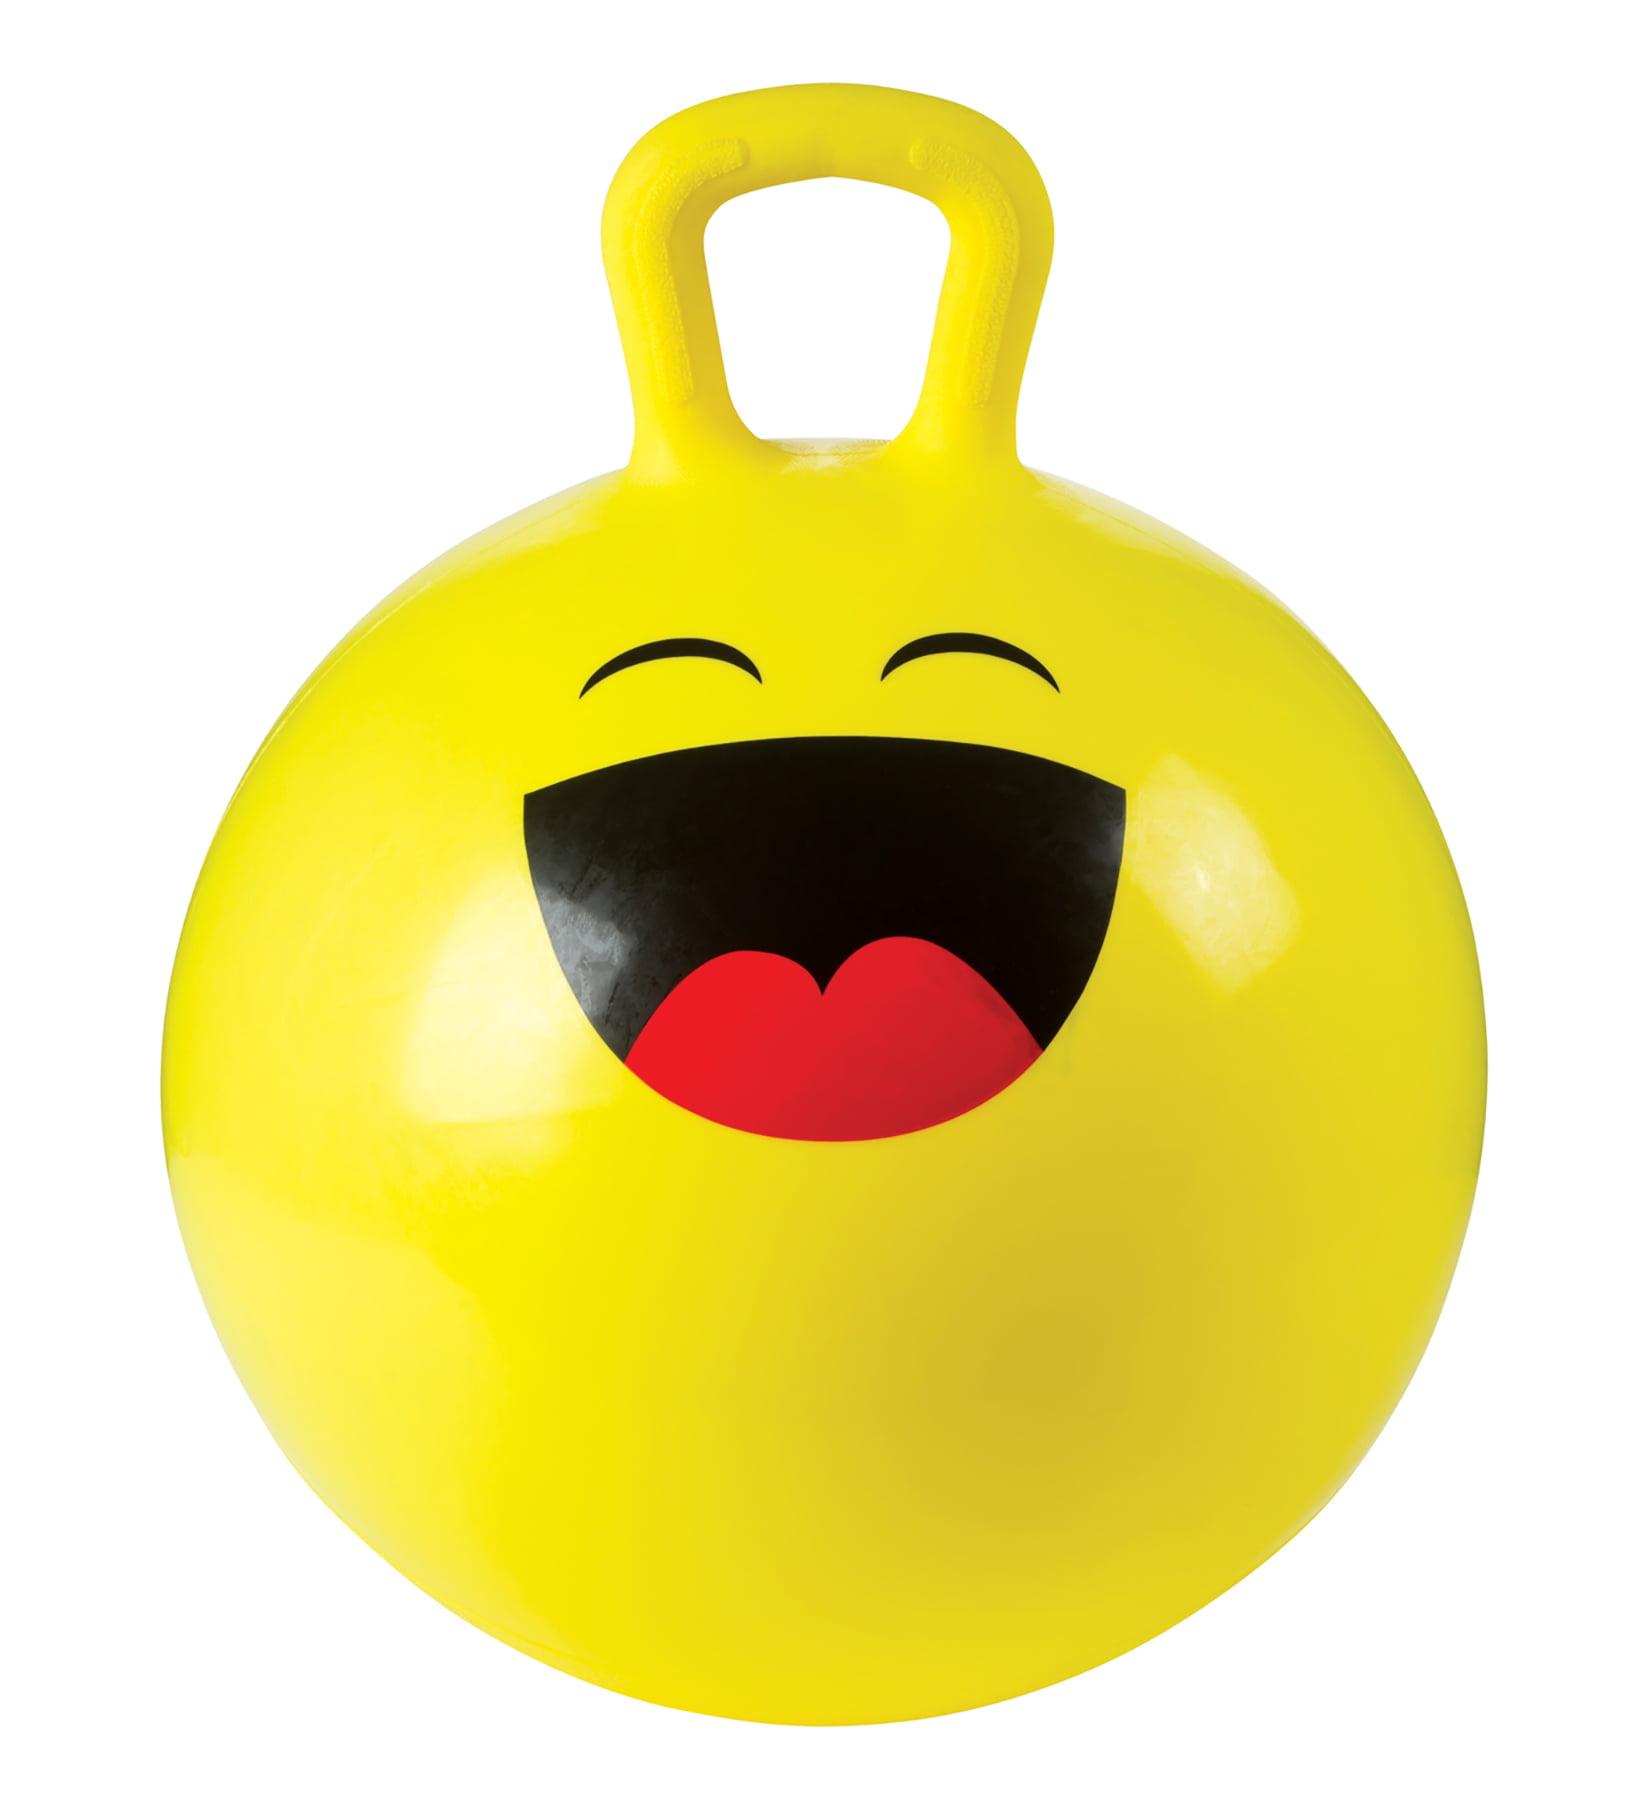 Toysmith 18In Emoji Hoppy Ball With Pump (Assorted Styles)